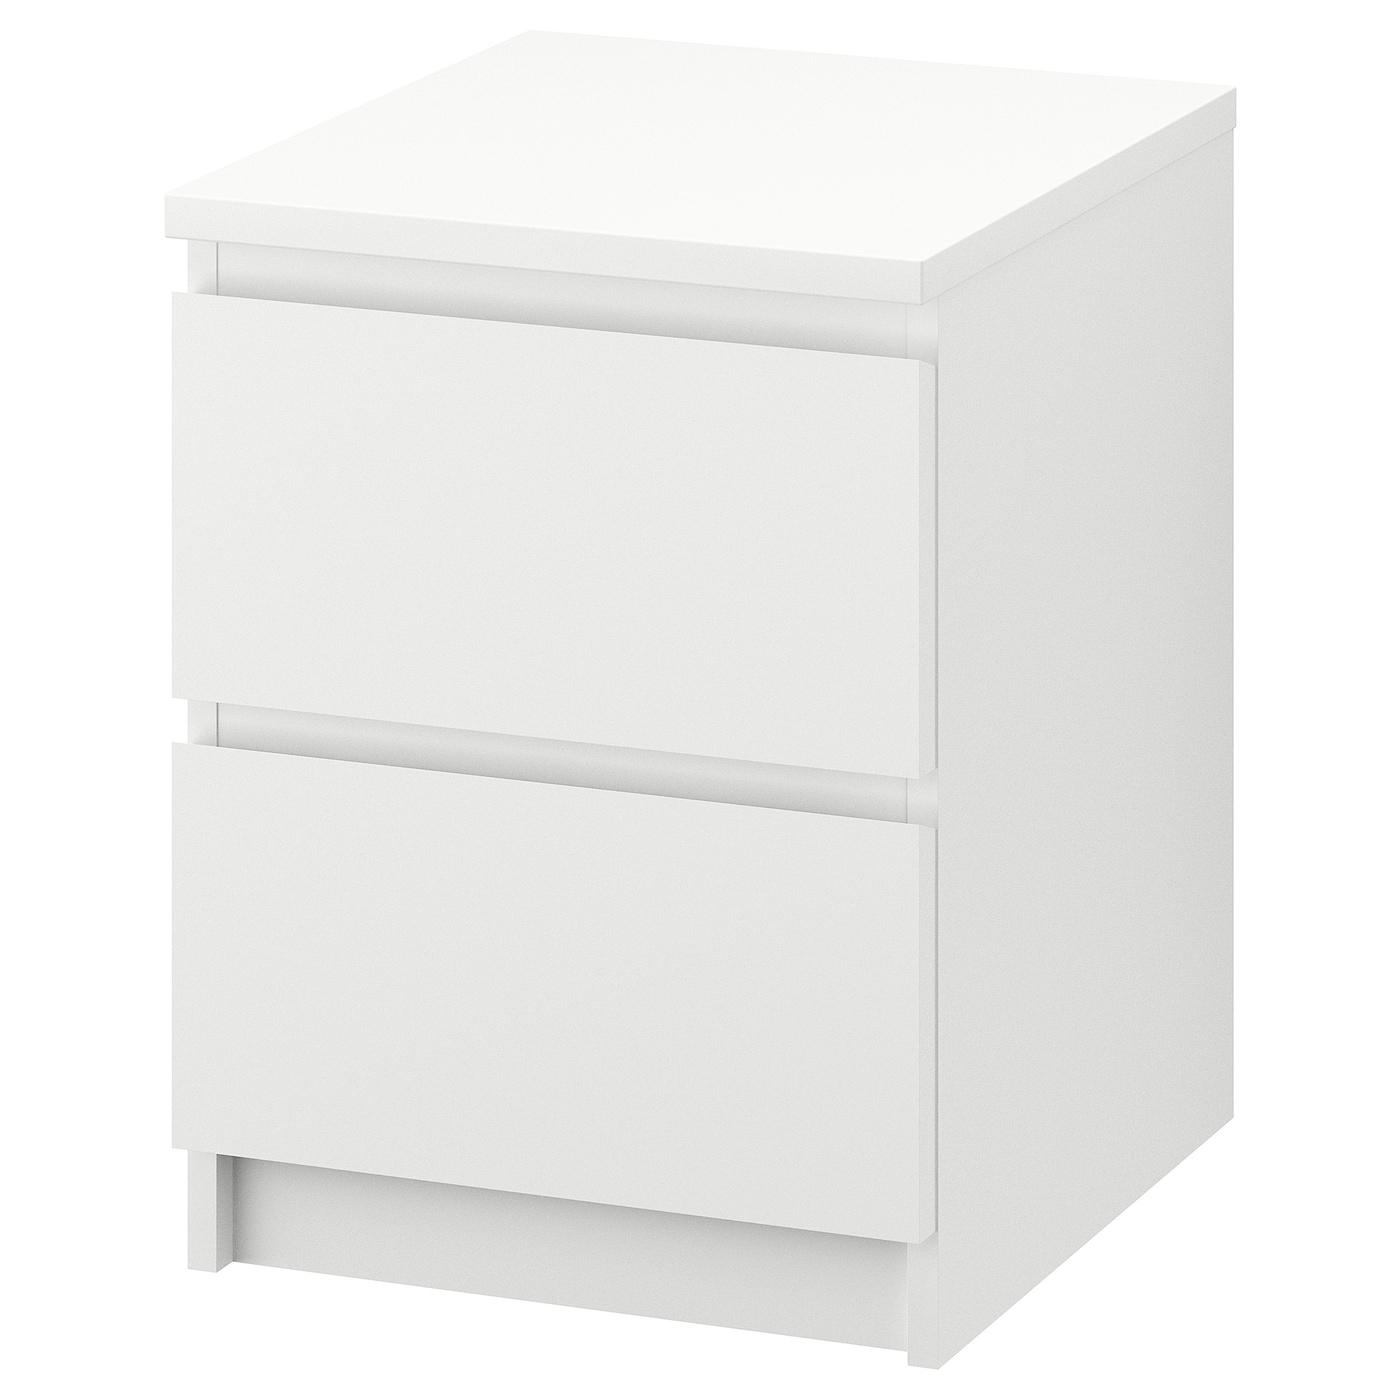 Ikea Meuble Blanc Laqué malm commode 2 tiroirs - blanc 40x55 cm